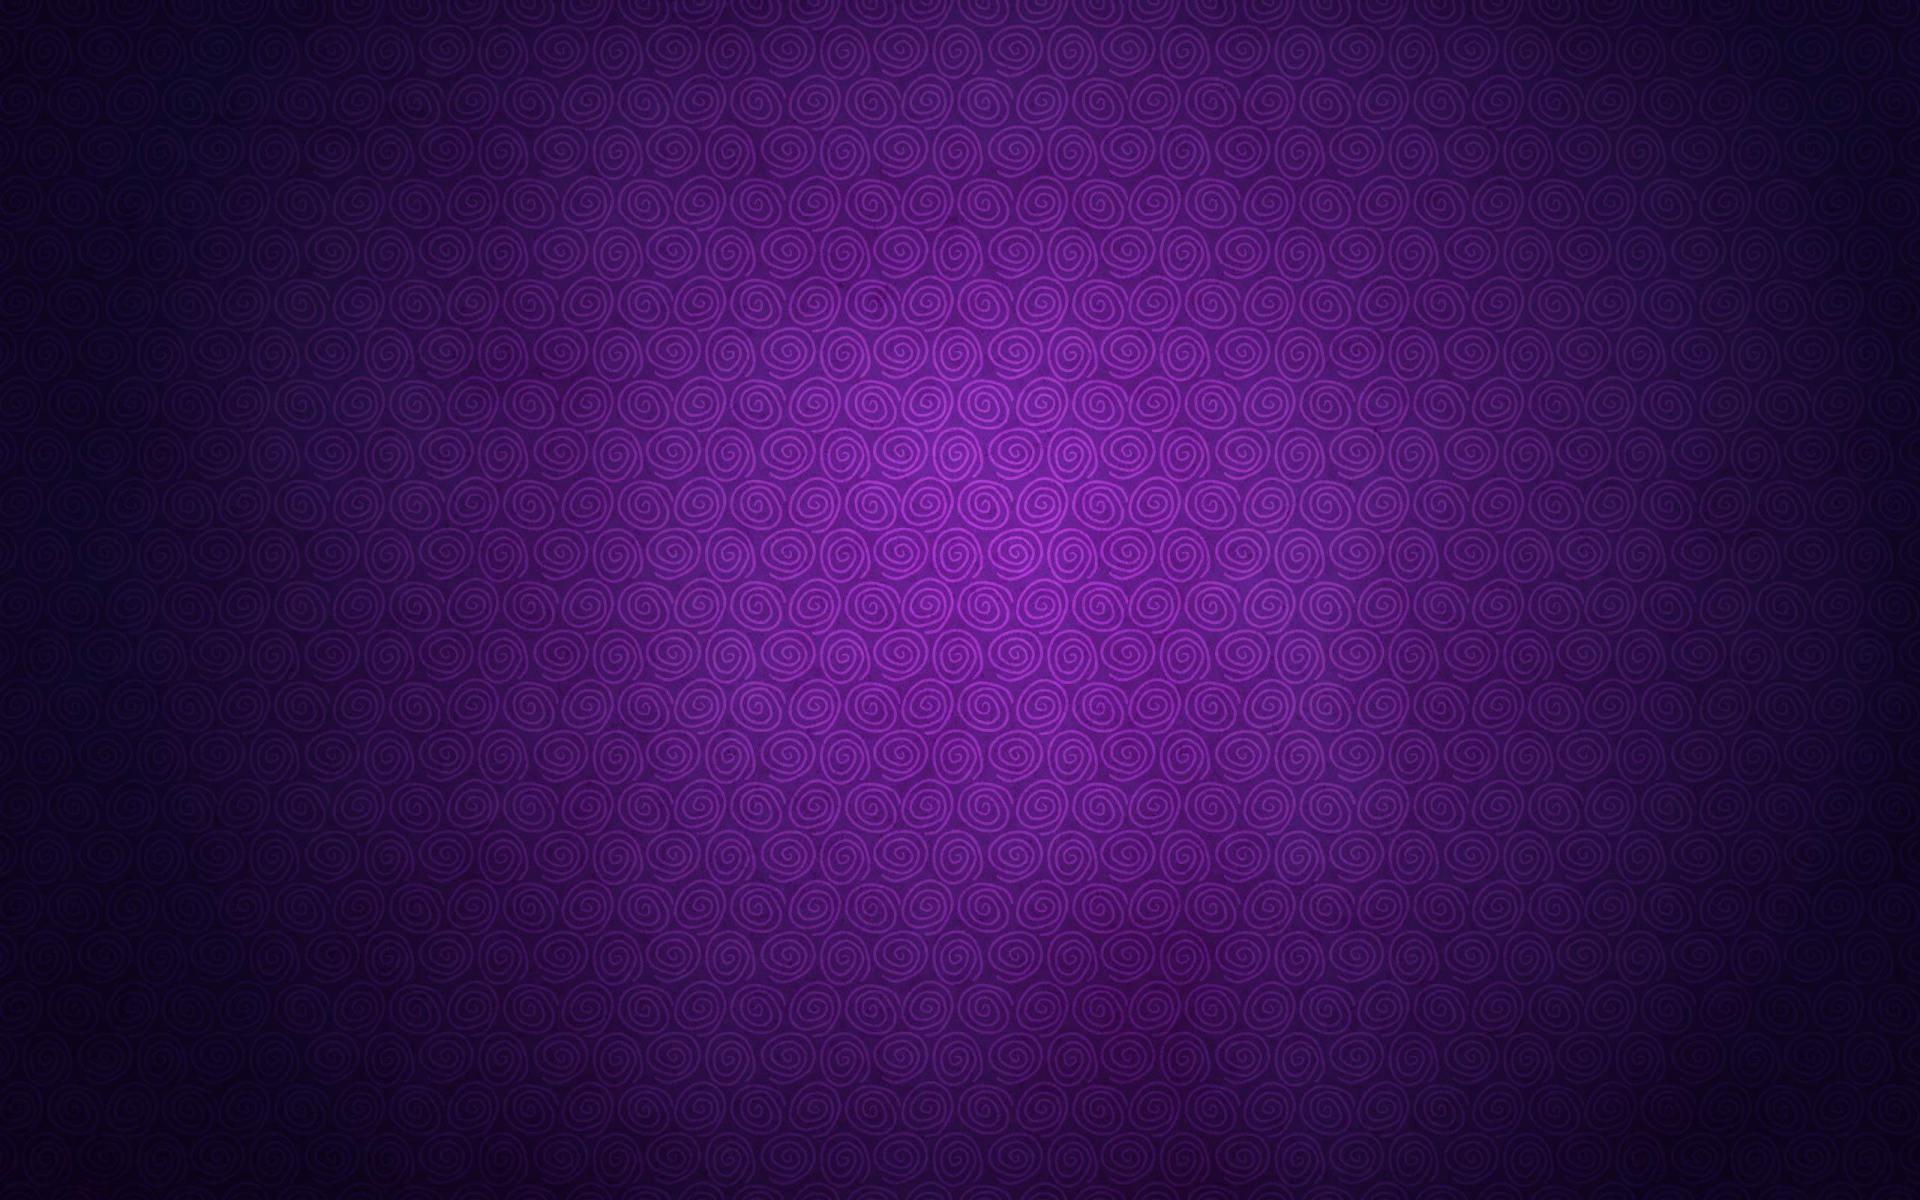 Purple Design Background 36 Images